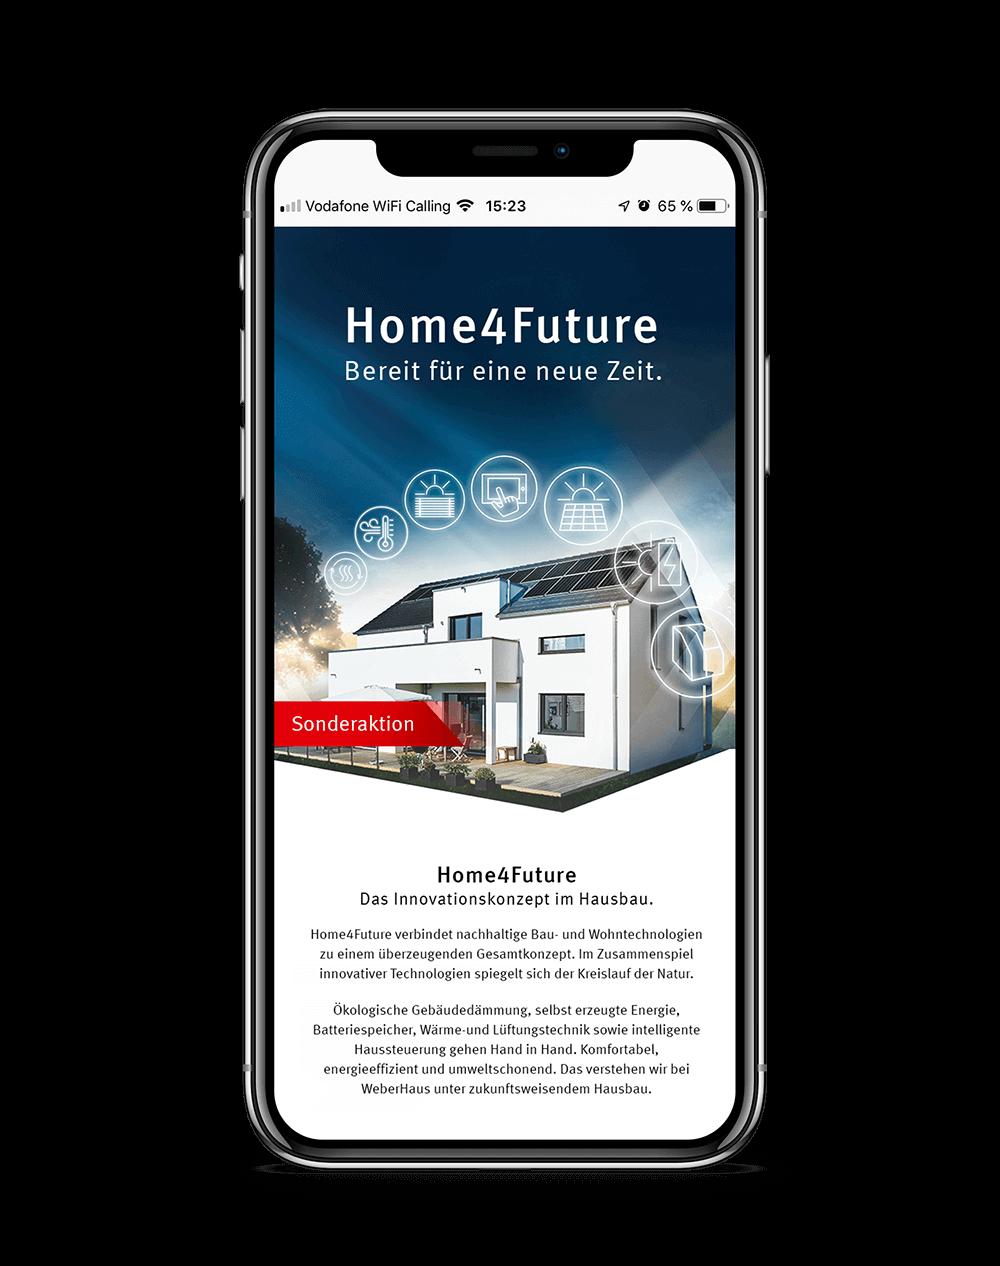 tessmar_brandevolution_weberhaus_home4future-phone